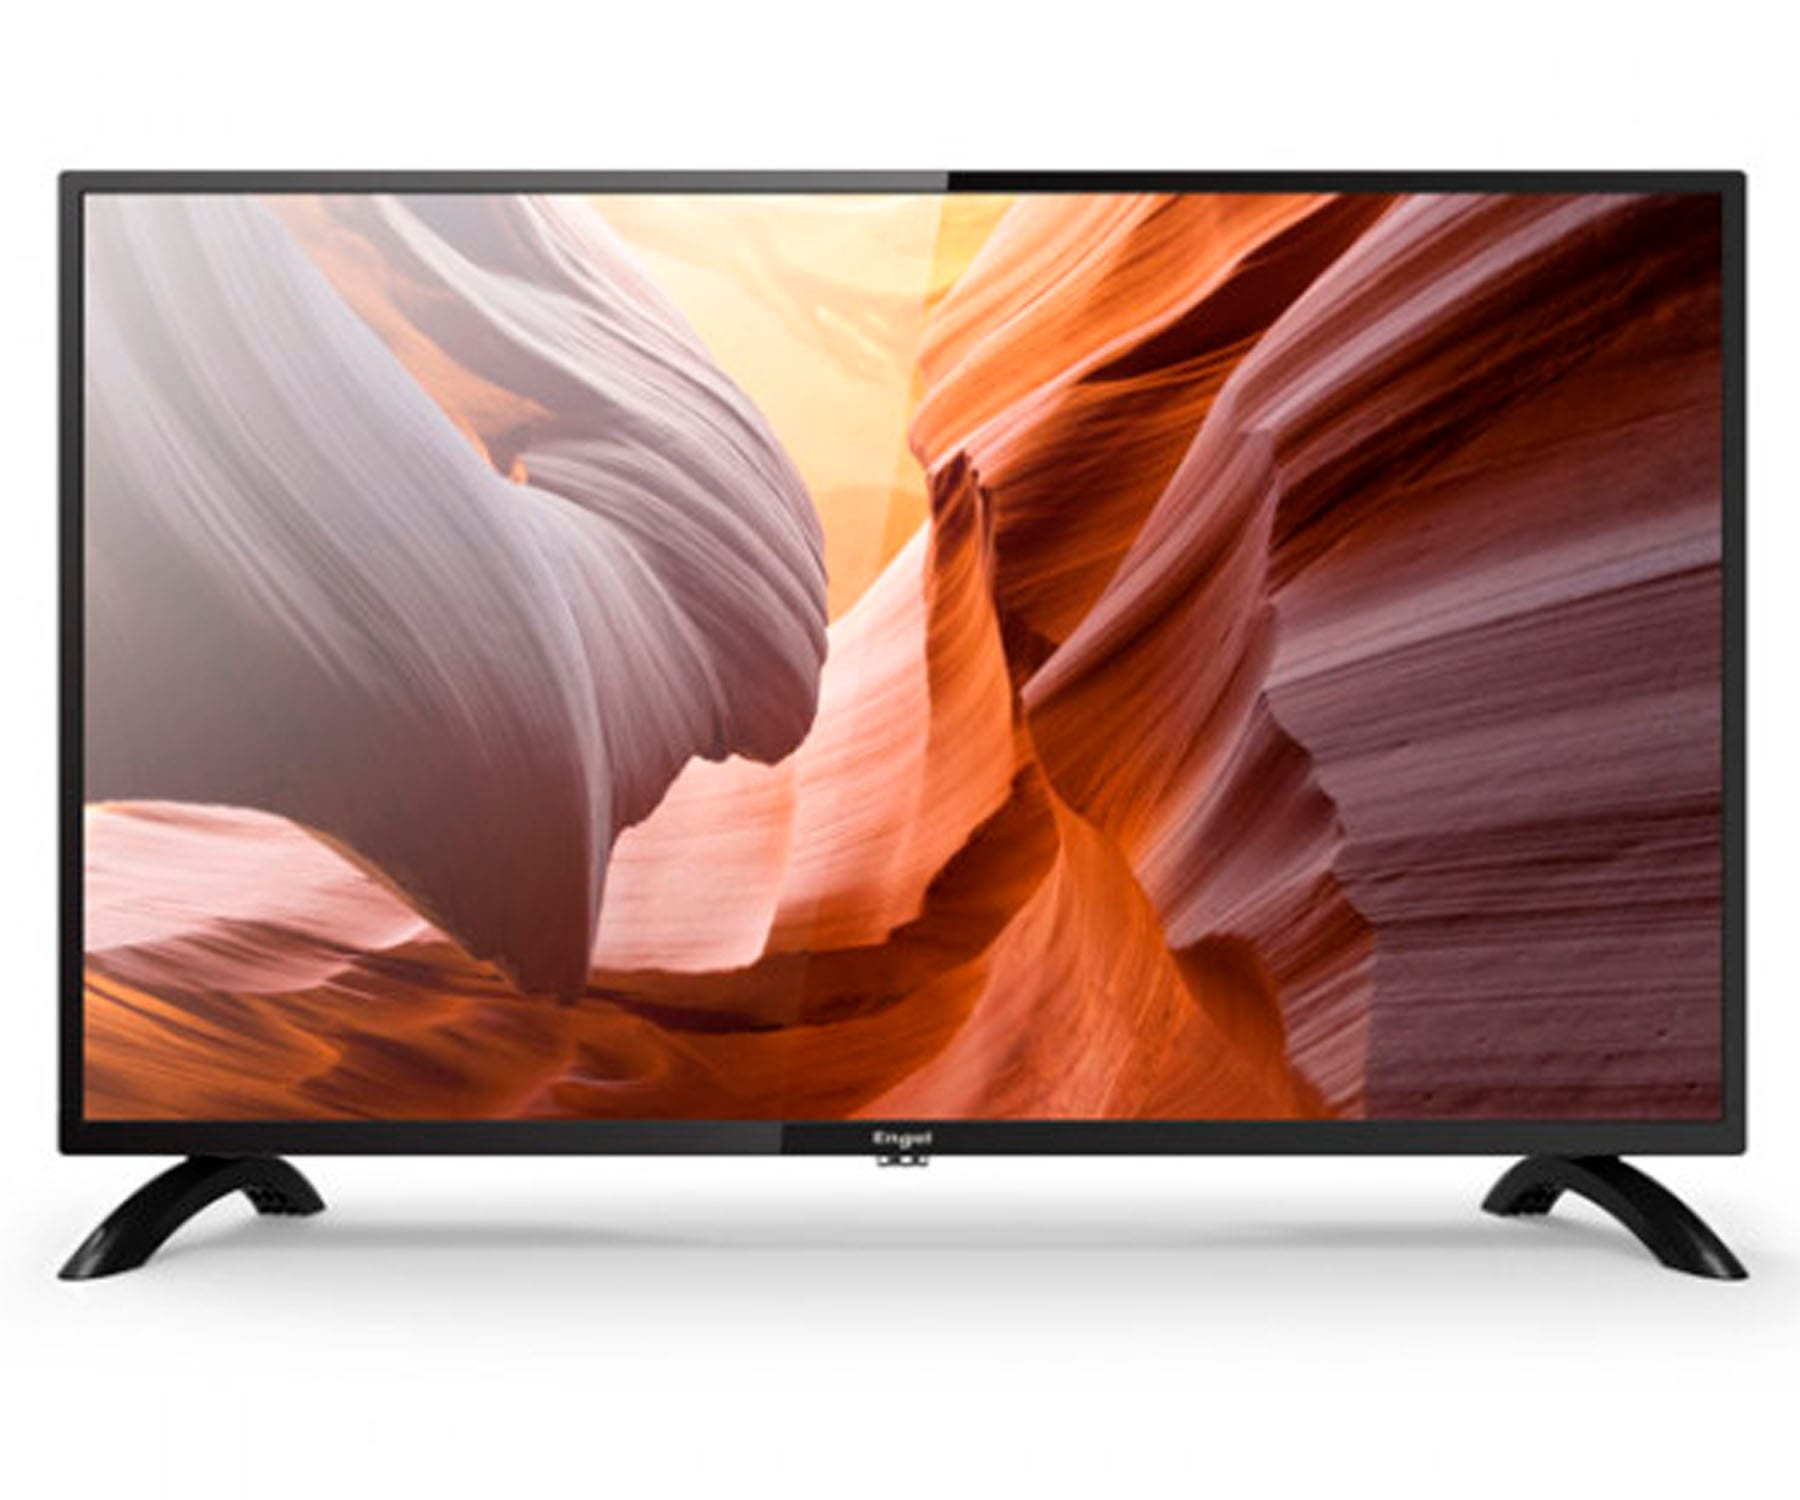 ENGEL 32LE3260T2 TELEVISOR 32 LCD LED HD READY HDMI VGA USB REPRODUCTOR Y GRABADOR MULTIMEDIA TDT2